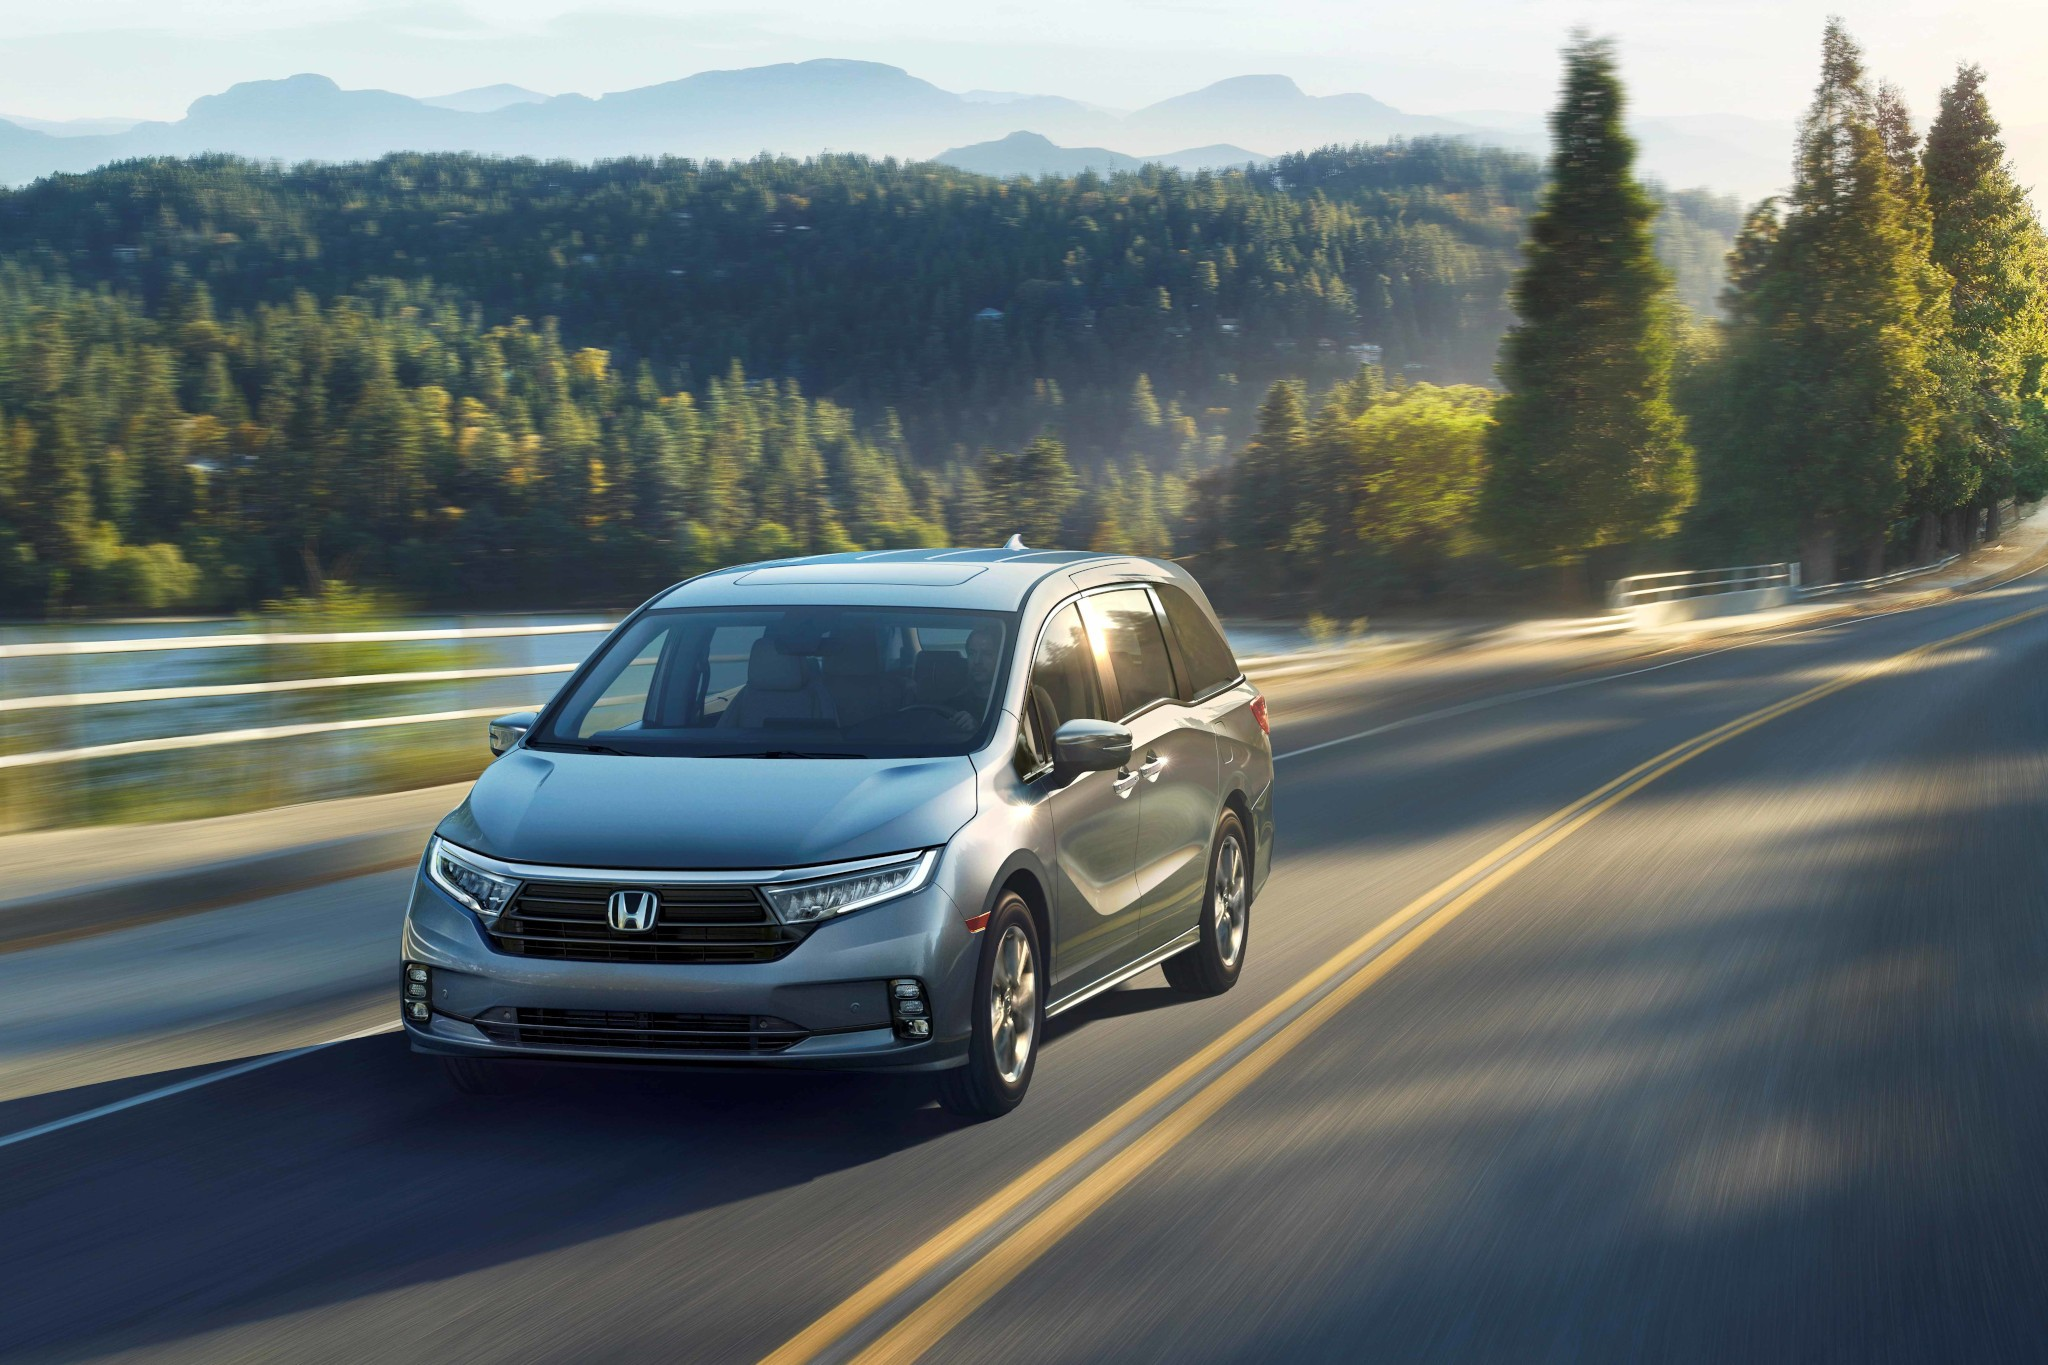 2021 Honda Odyssey: Updated Styling, Upgraded Safety